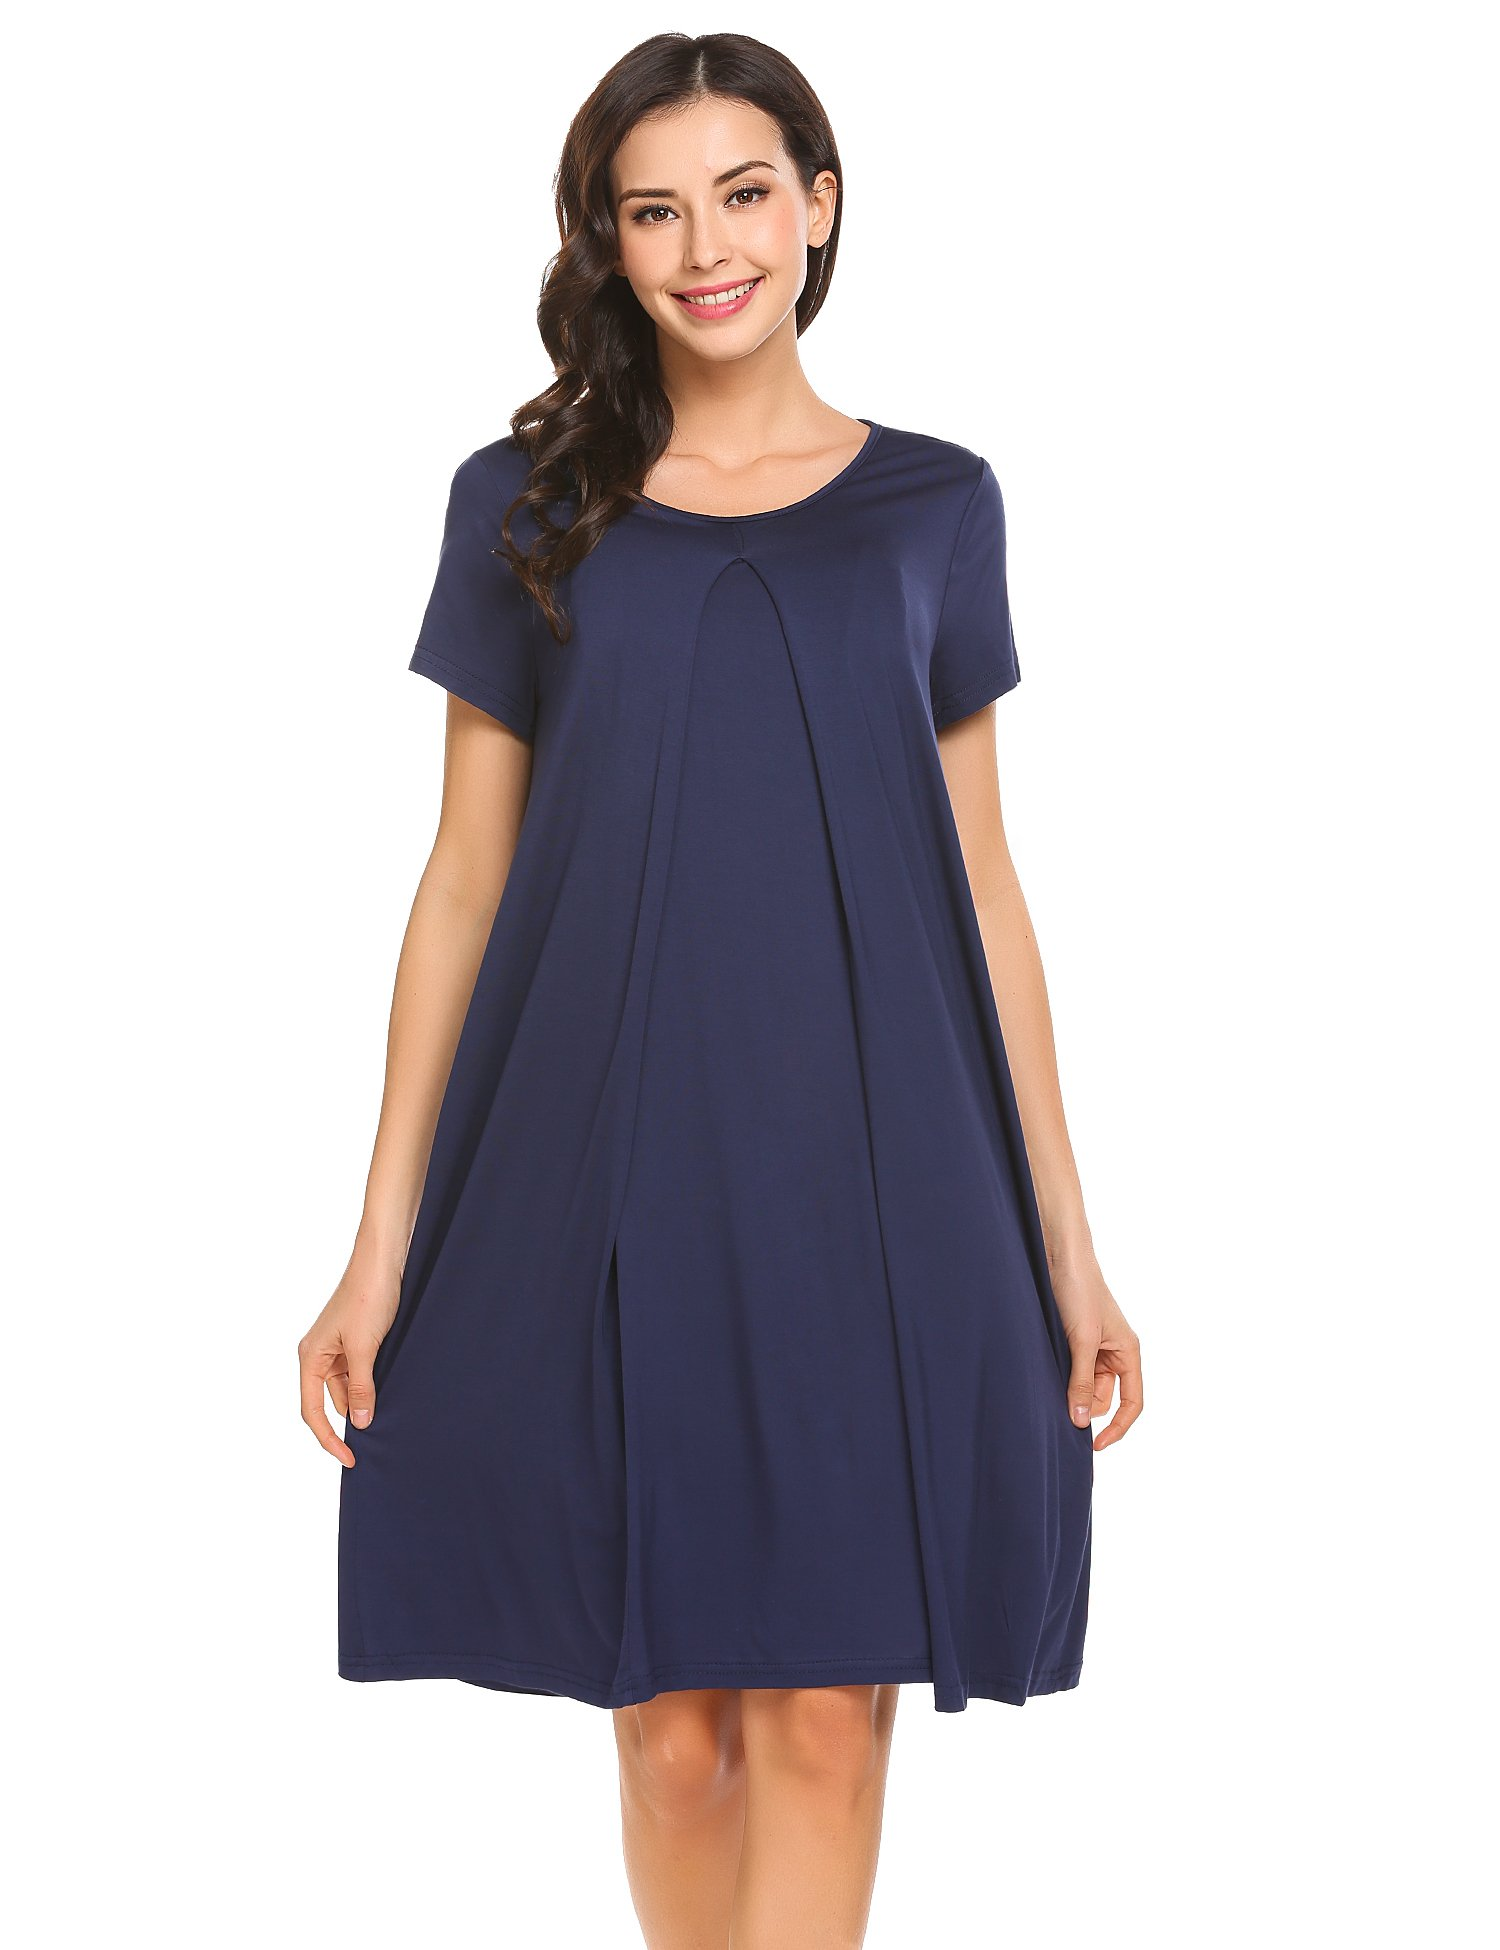 Ekouaer Womens Maternity Nursing Nightgown Round Neck Short Sleeve Sleep Dress (07 Navy Blue, XXL)